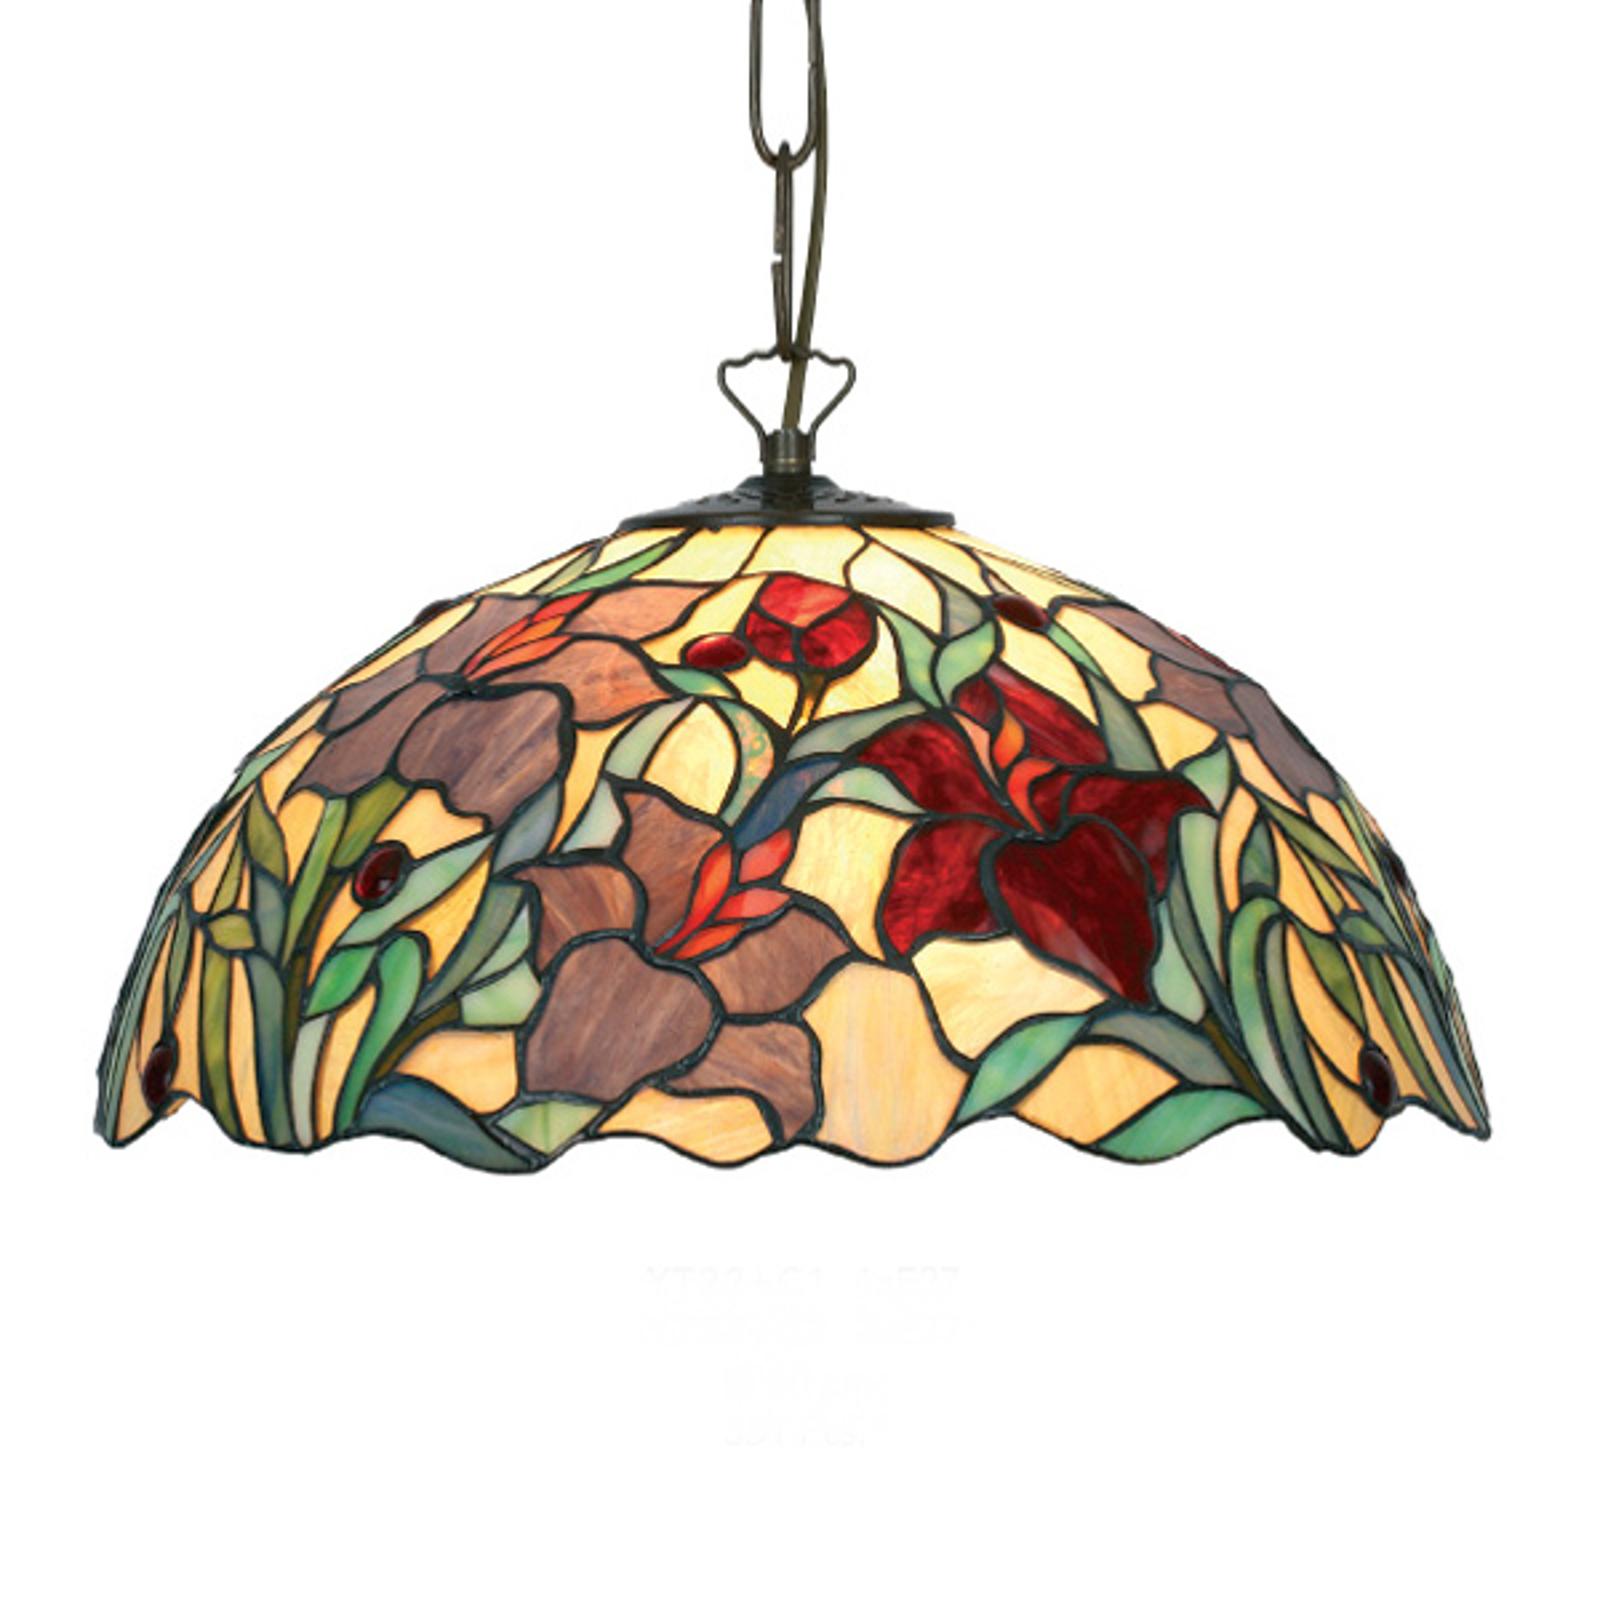 Mooie hanglamp Athina in Tiffany-stijl